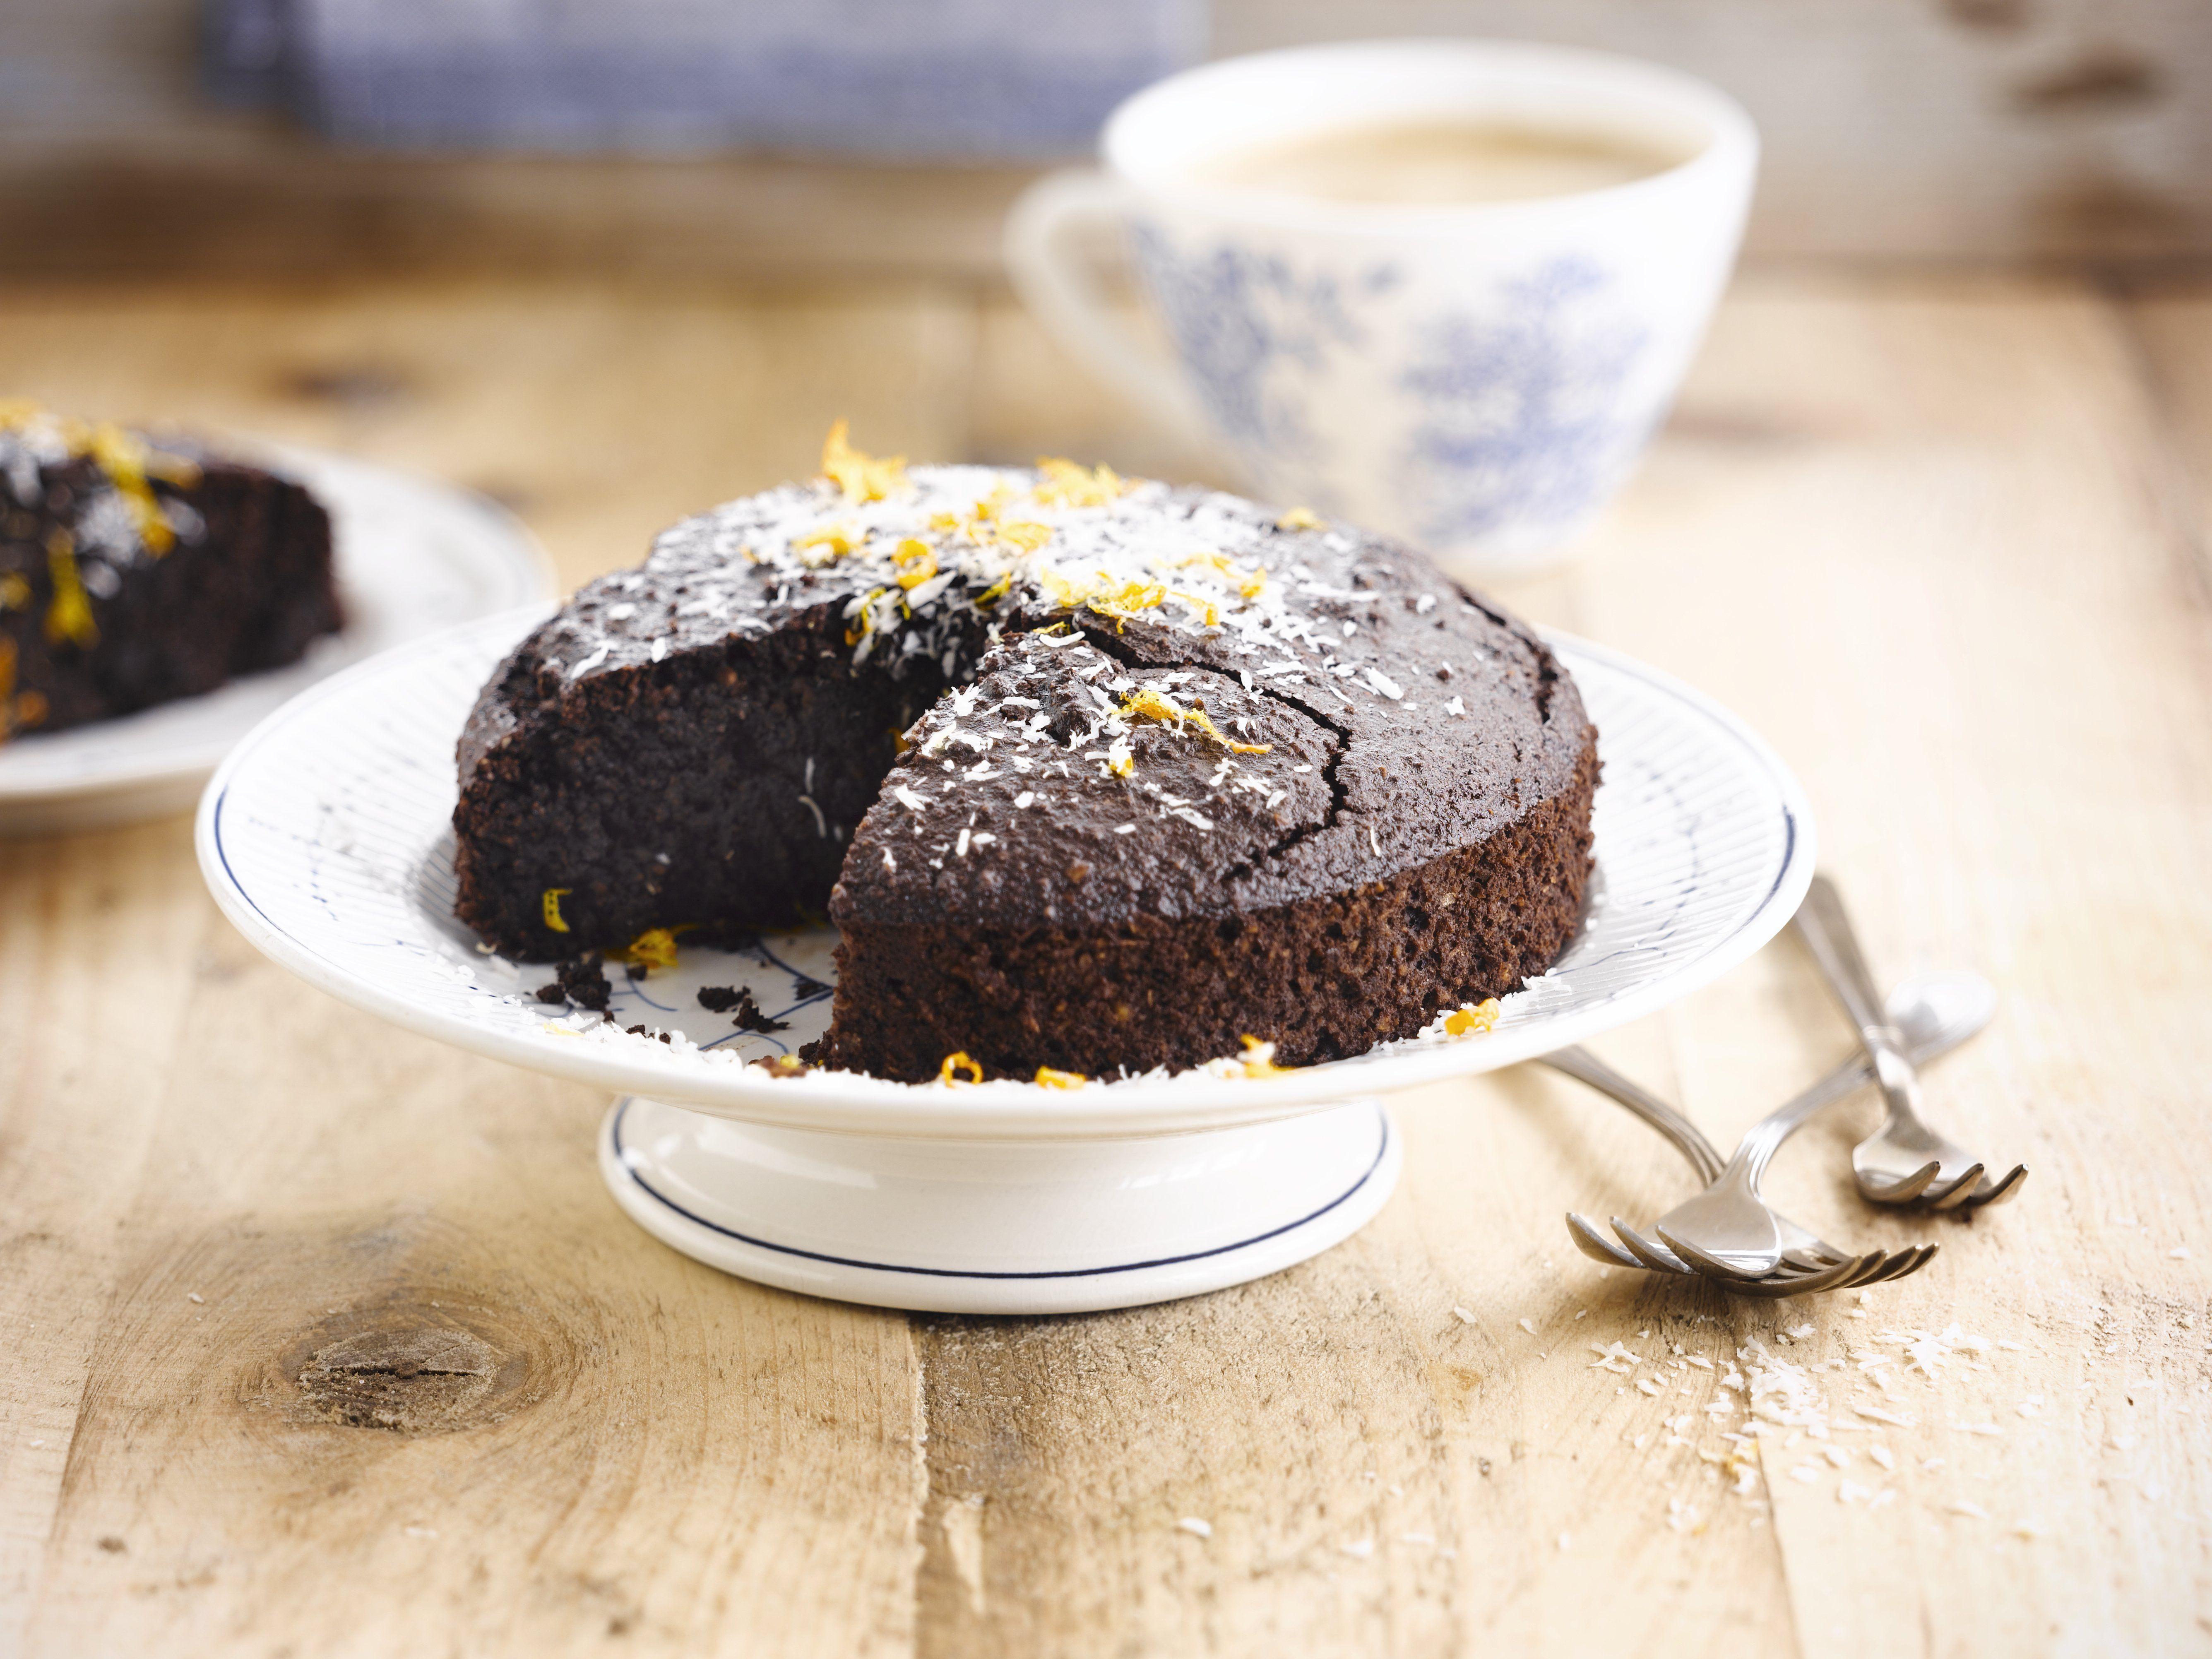 Keto Cake Recipe Thermomix: Himmlischer Schokoladen-Kokosnuss Kuchen